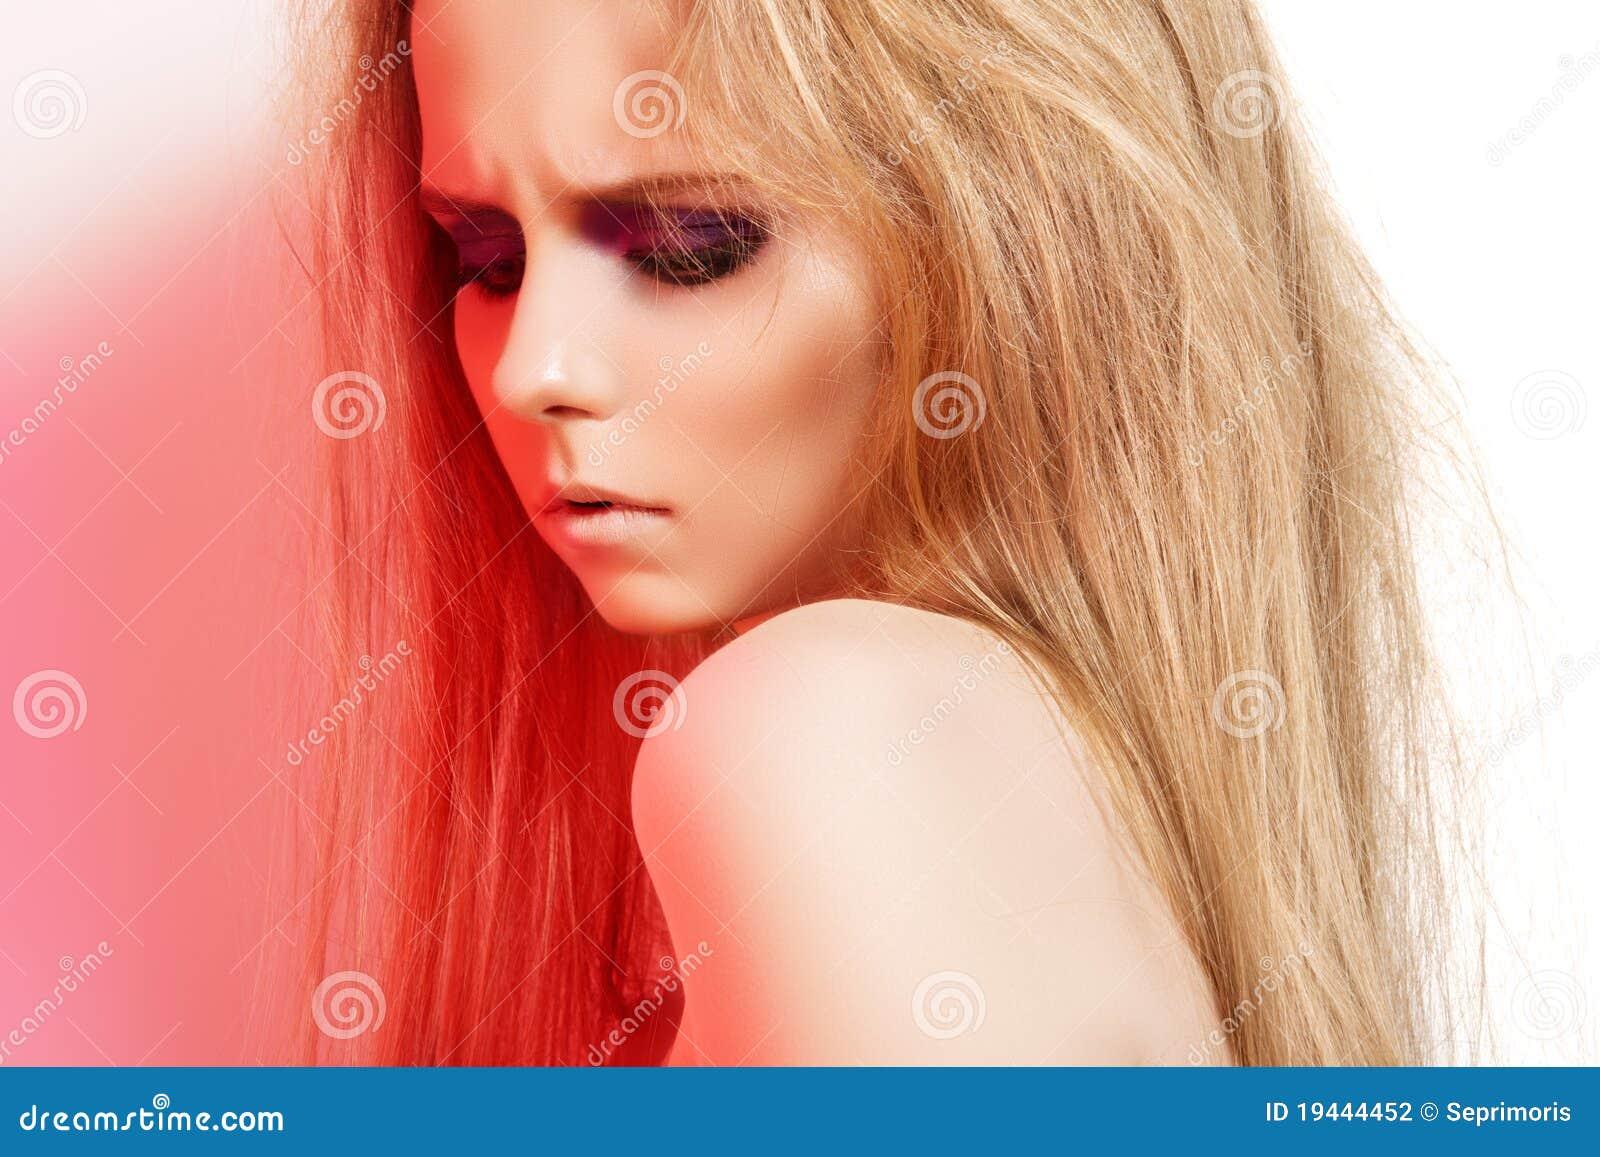 girl on rock make - photo #1